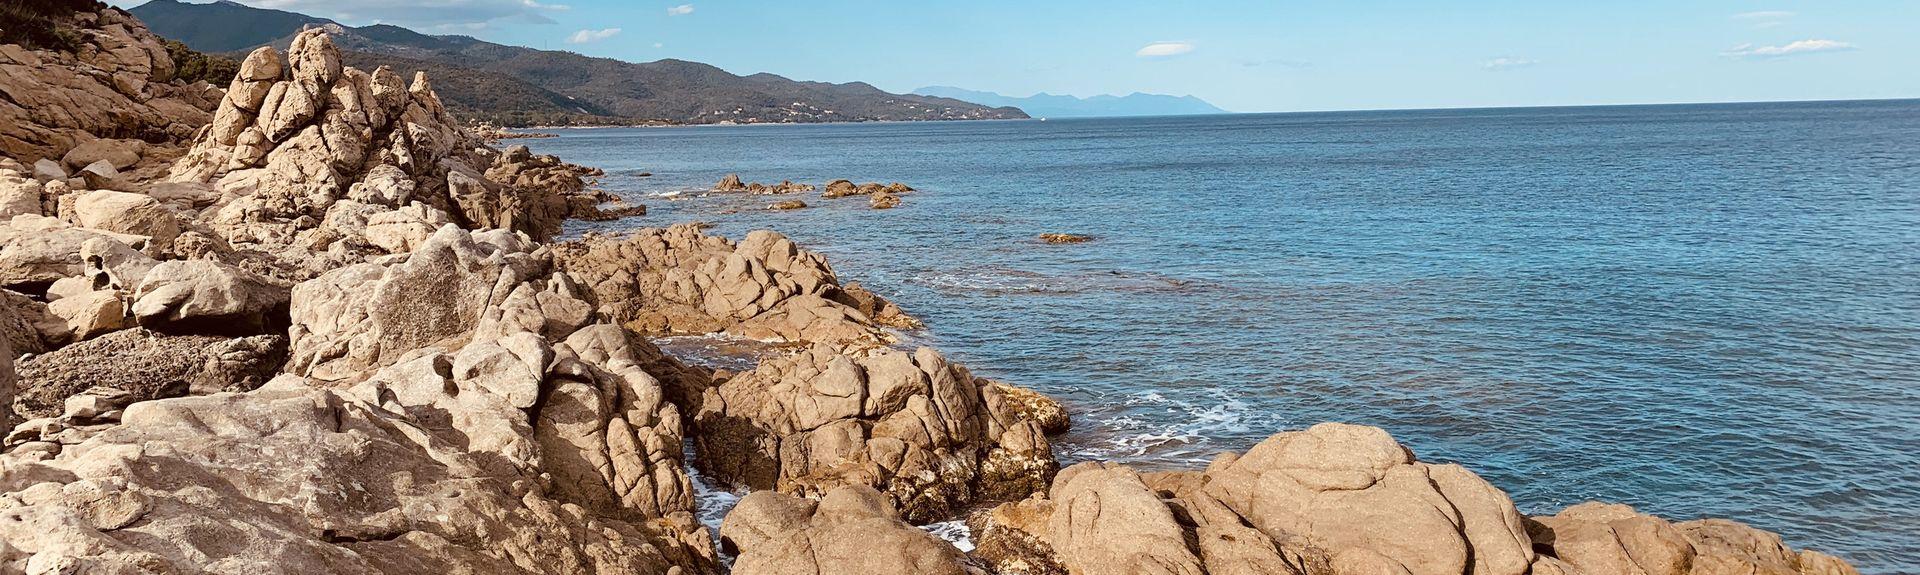 Canella Beach, Sari-Solenzara, Corse-du-Sud, France